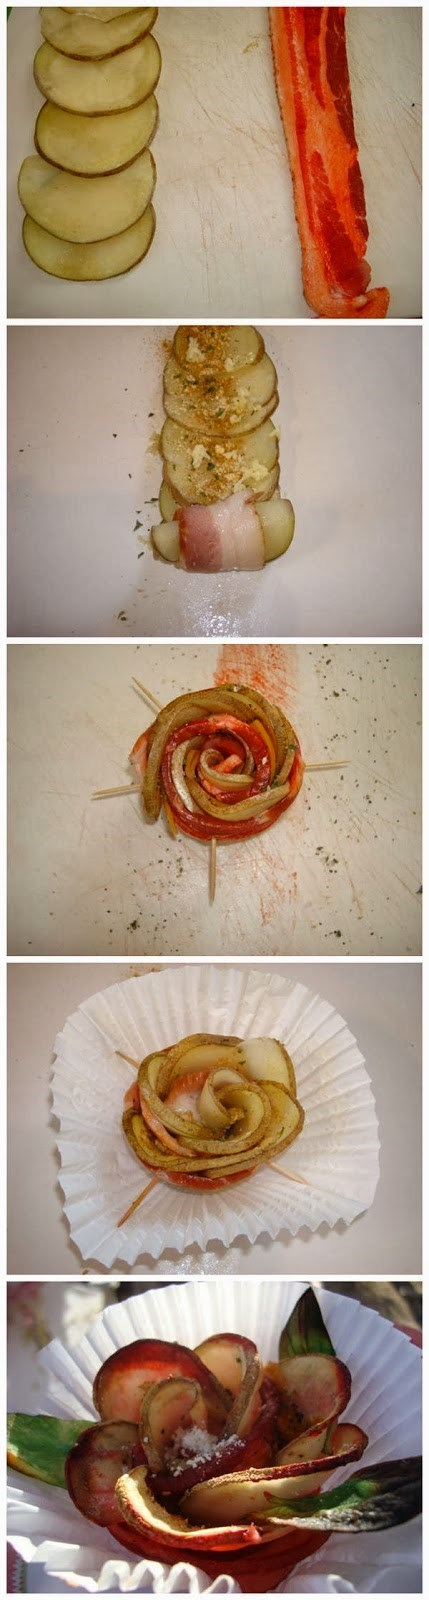 rose,DIY,food,bacon